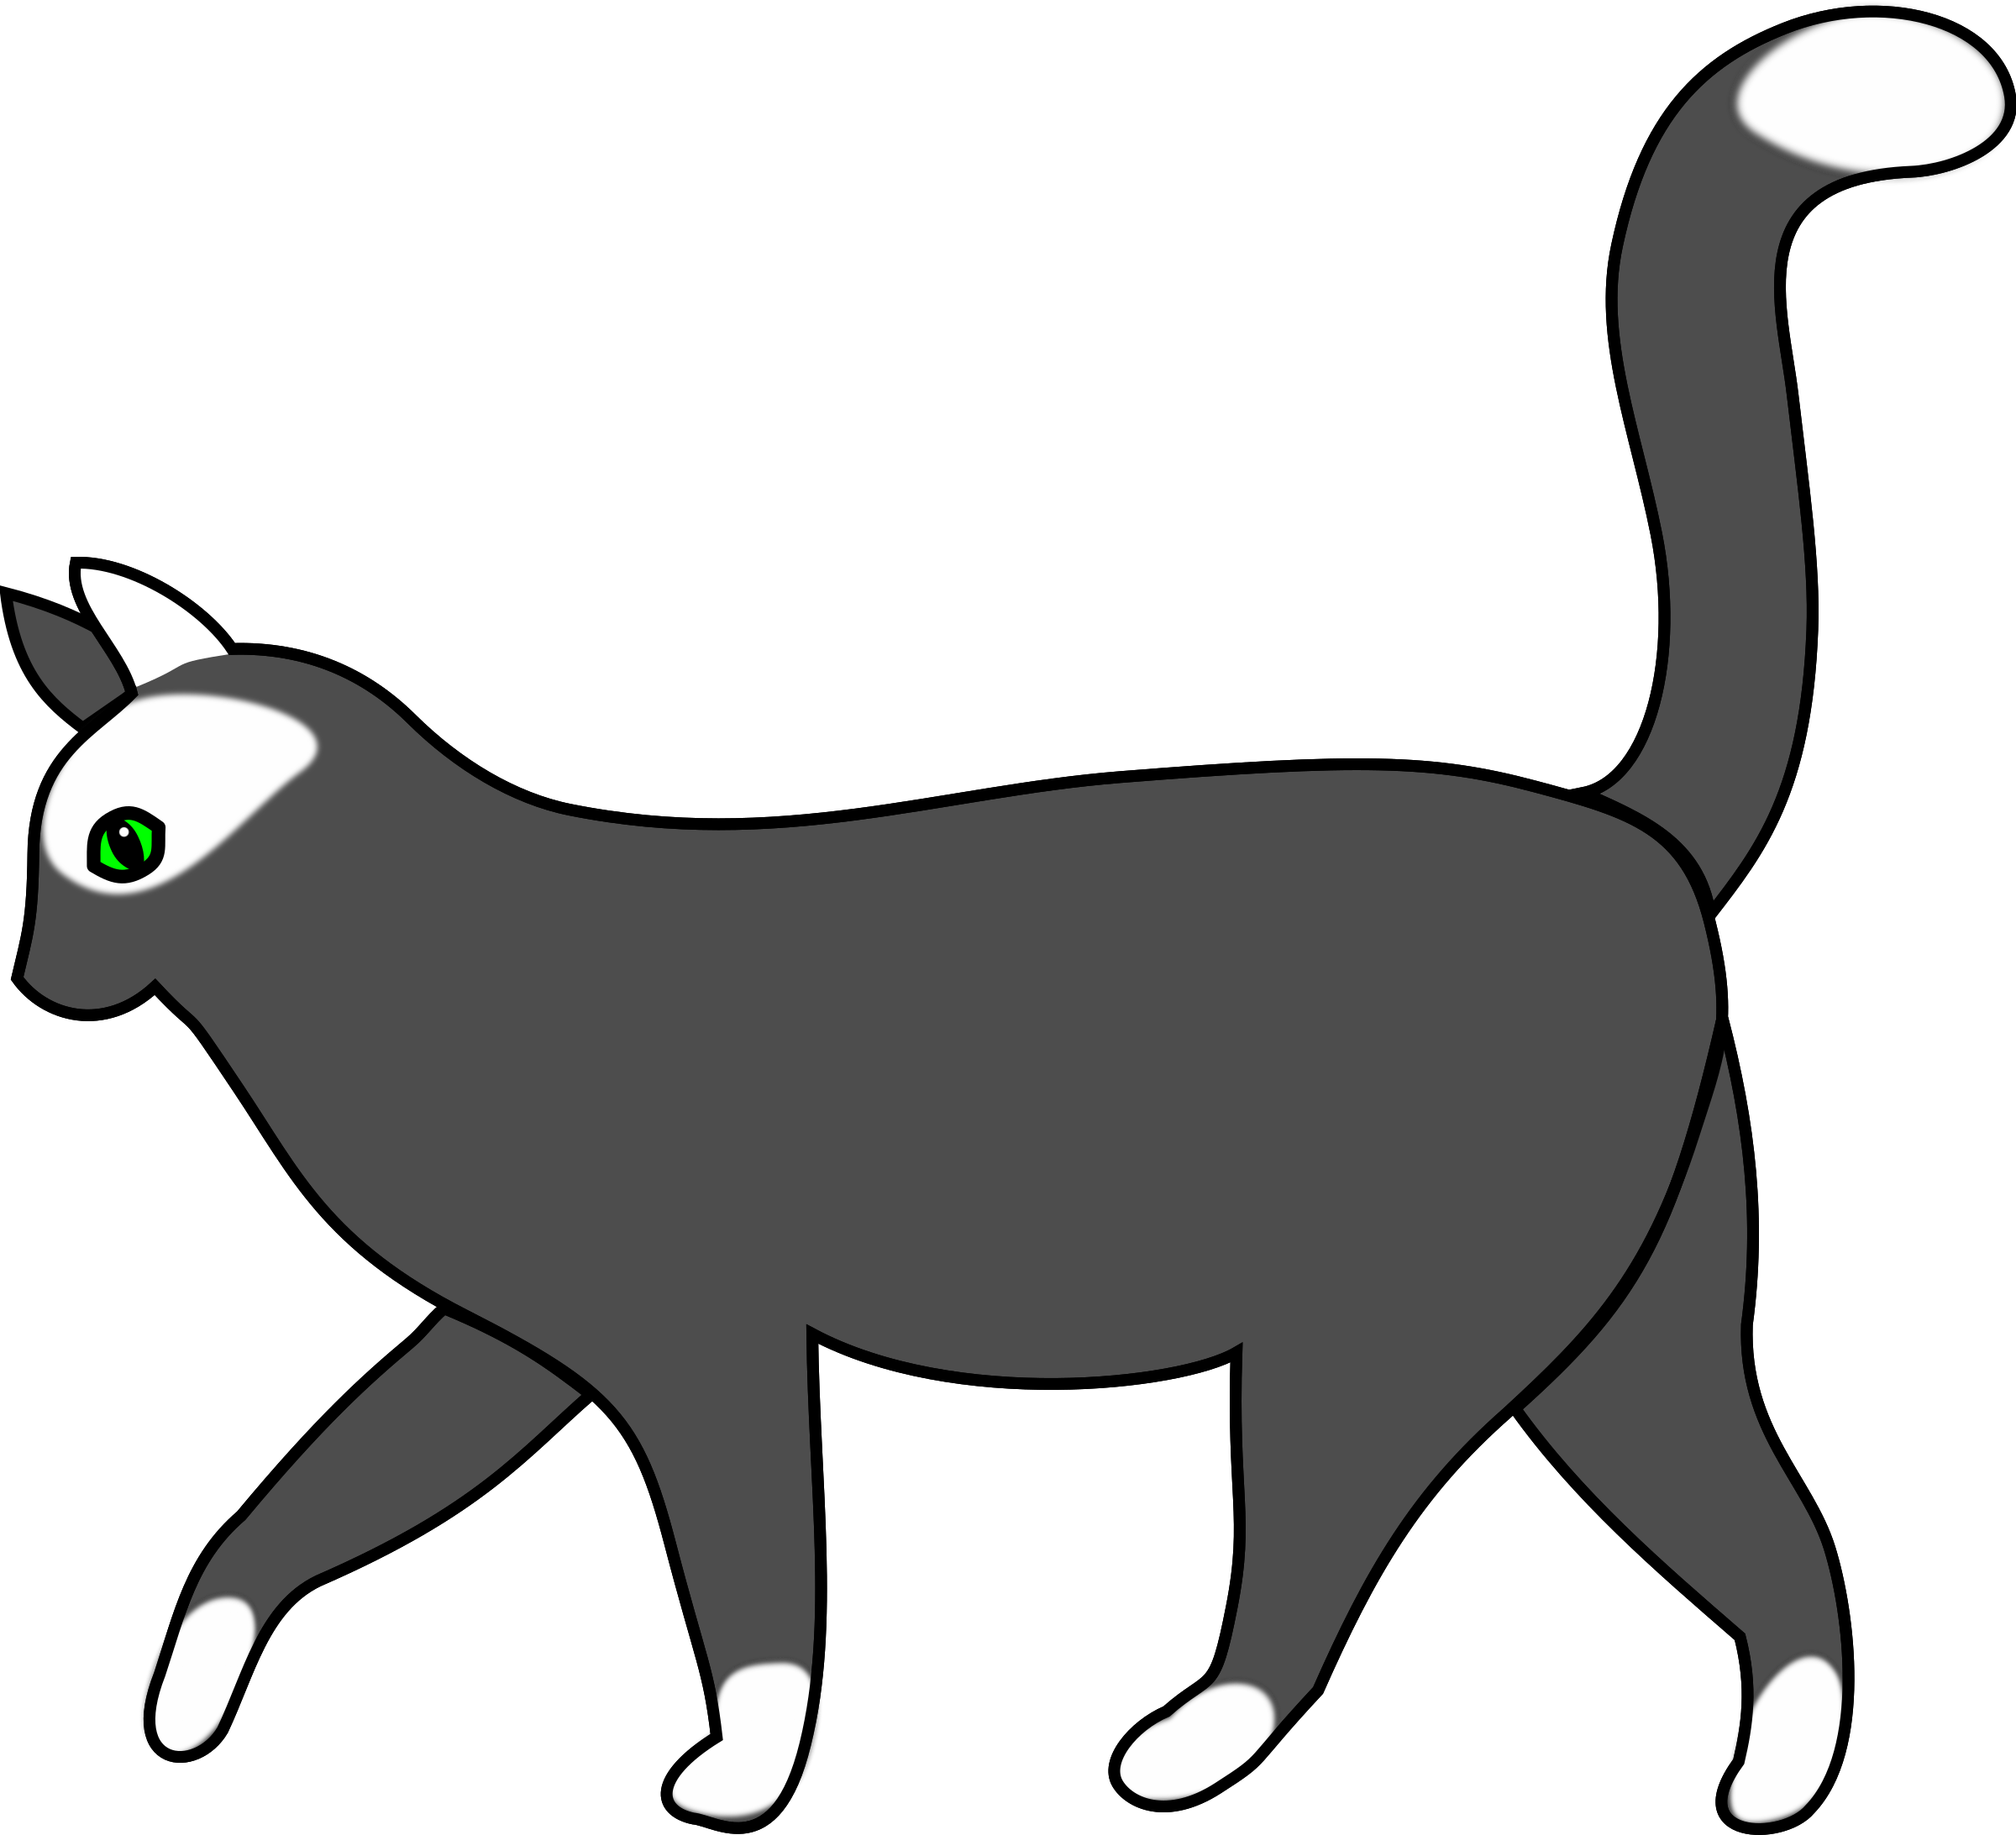 free White big image png. Cat walking clipart